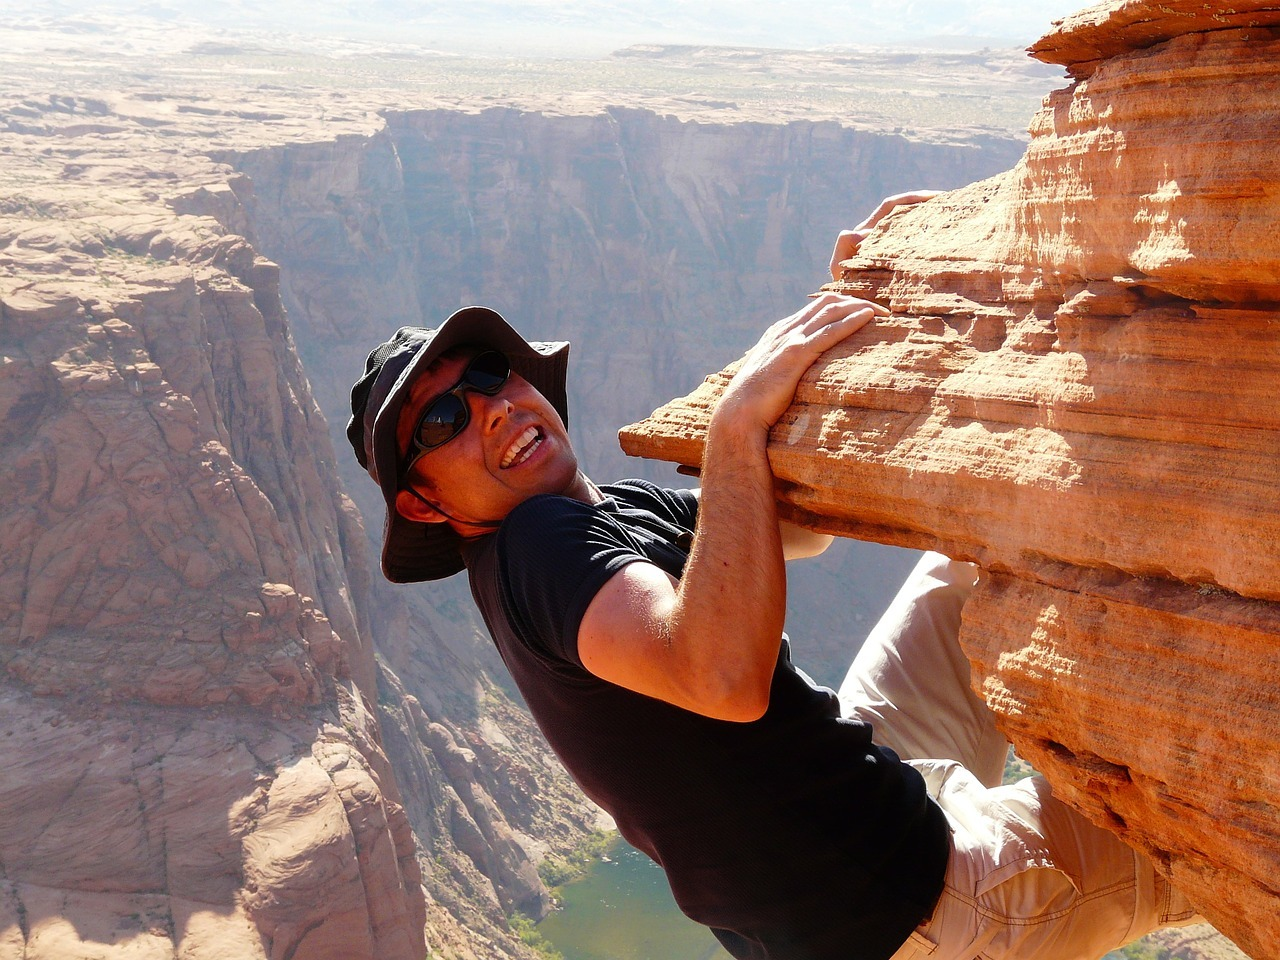 climberRockview